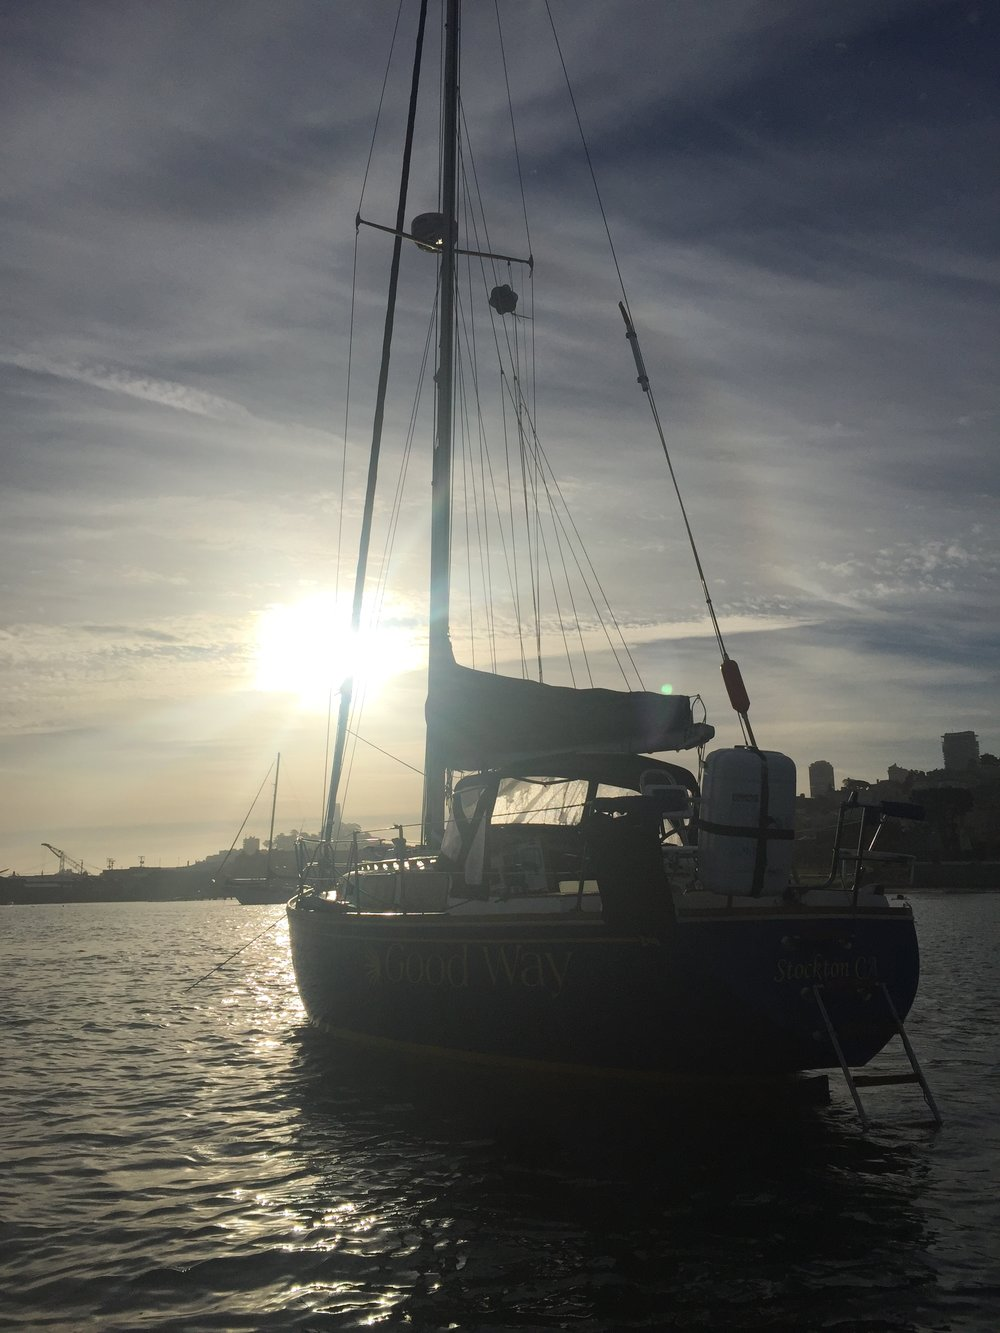 sunrise at aquatic park, san francisco